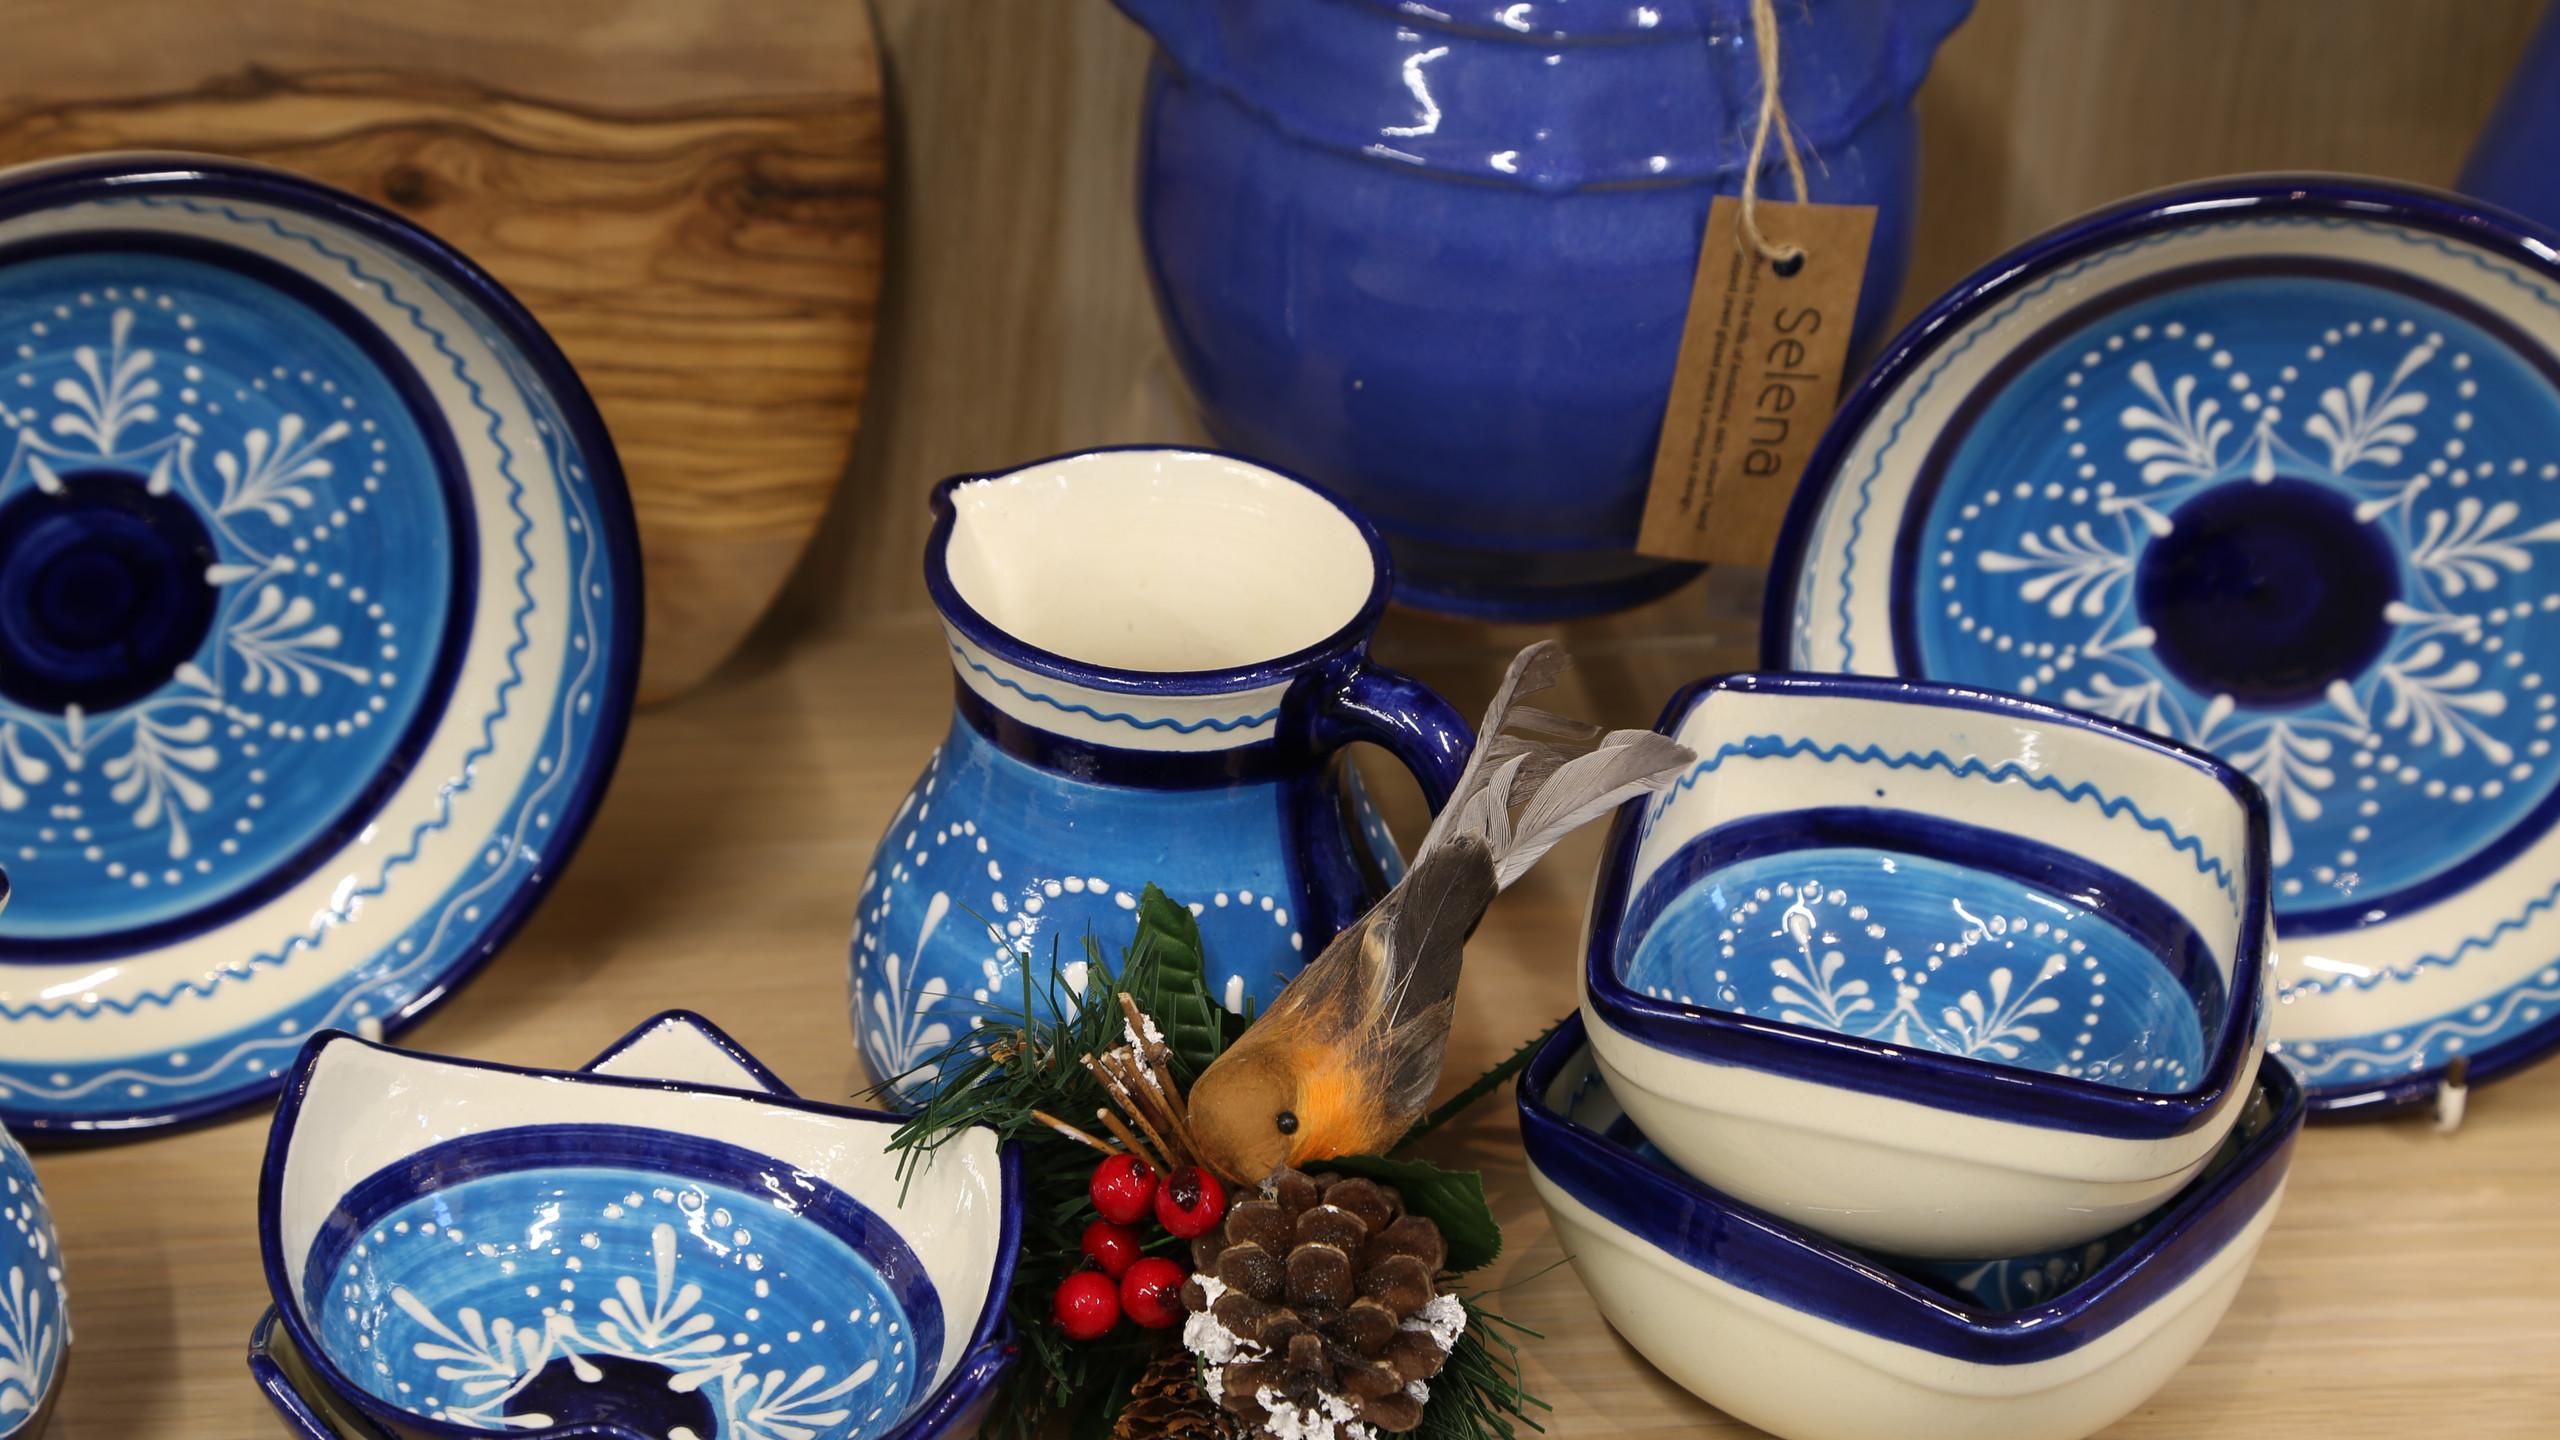 Blue patterned tableware